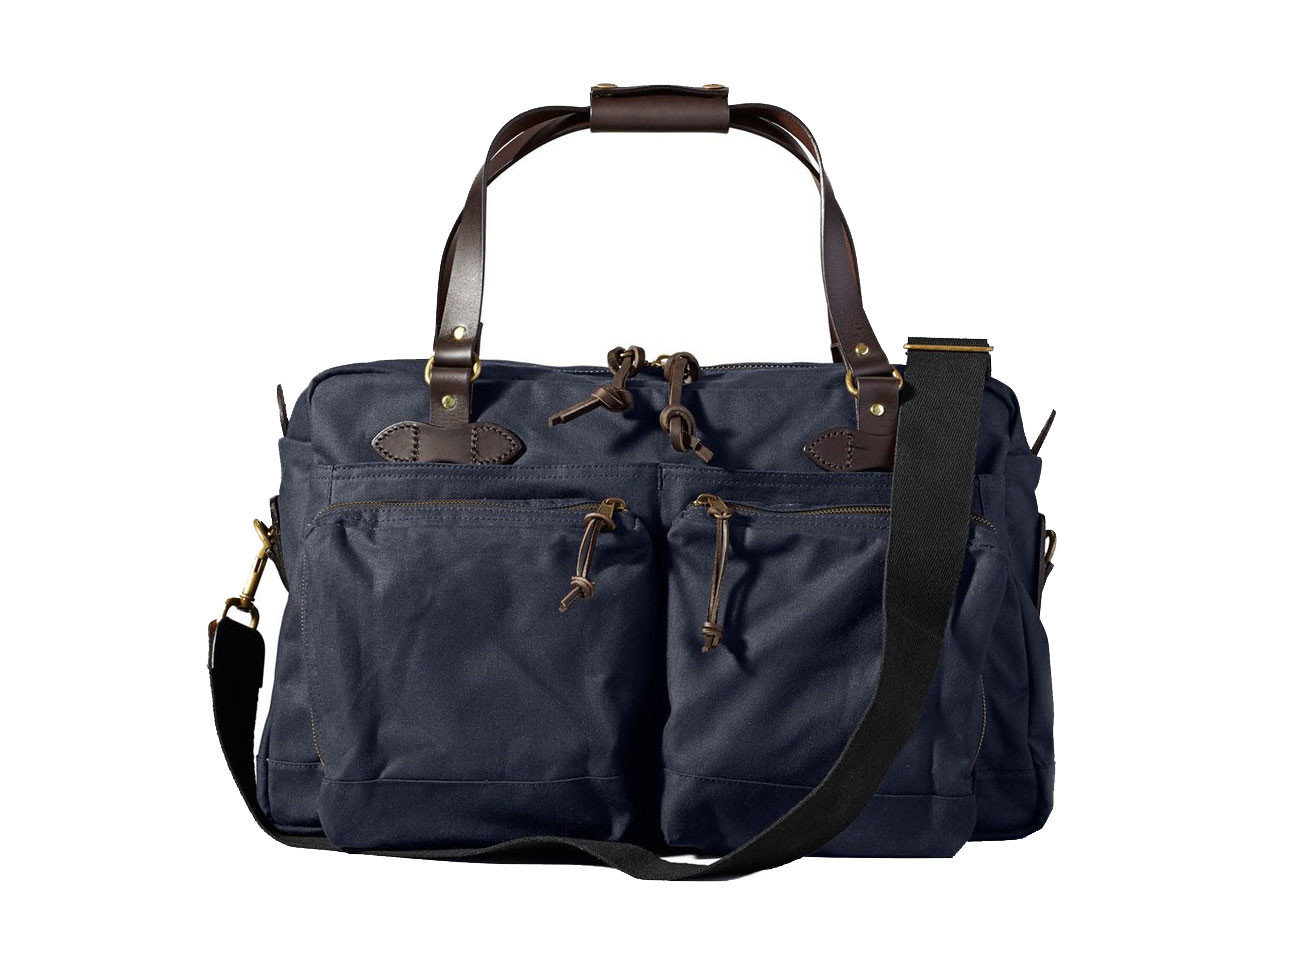 Style + Design accessory handbag bag luggage suitcase shoulder bag fashion accessory case electric blue tote bag leather